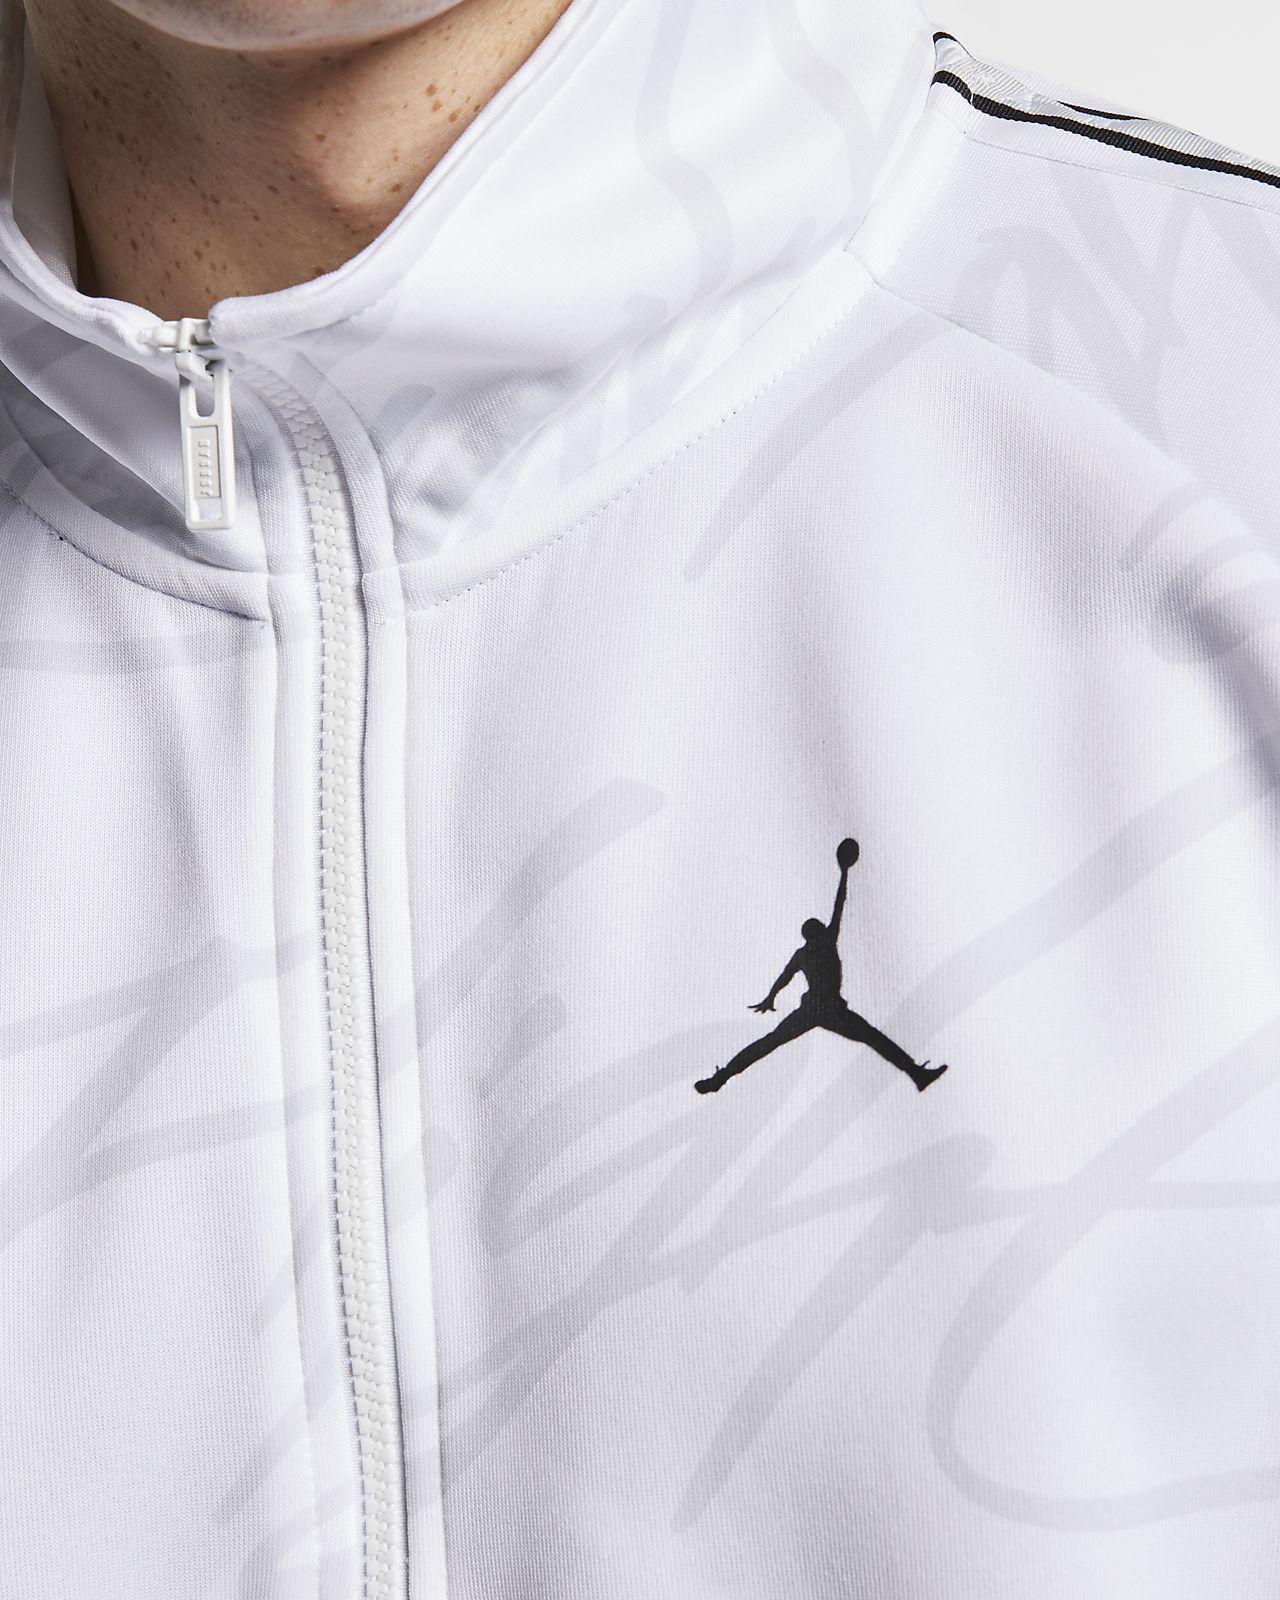 83af7420ea44 Jordan Jumpman Tricot Men s Graphic Jacket. Nike.com DK